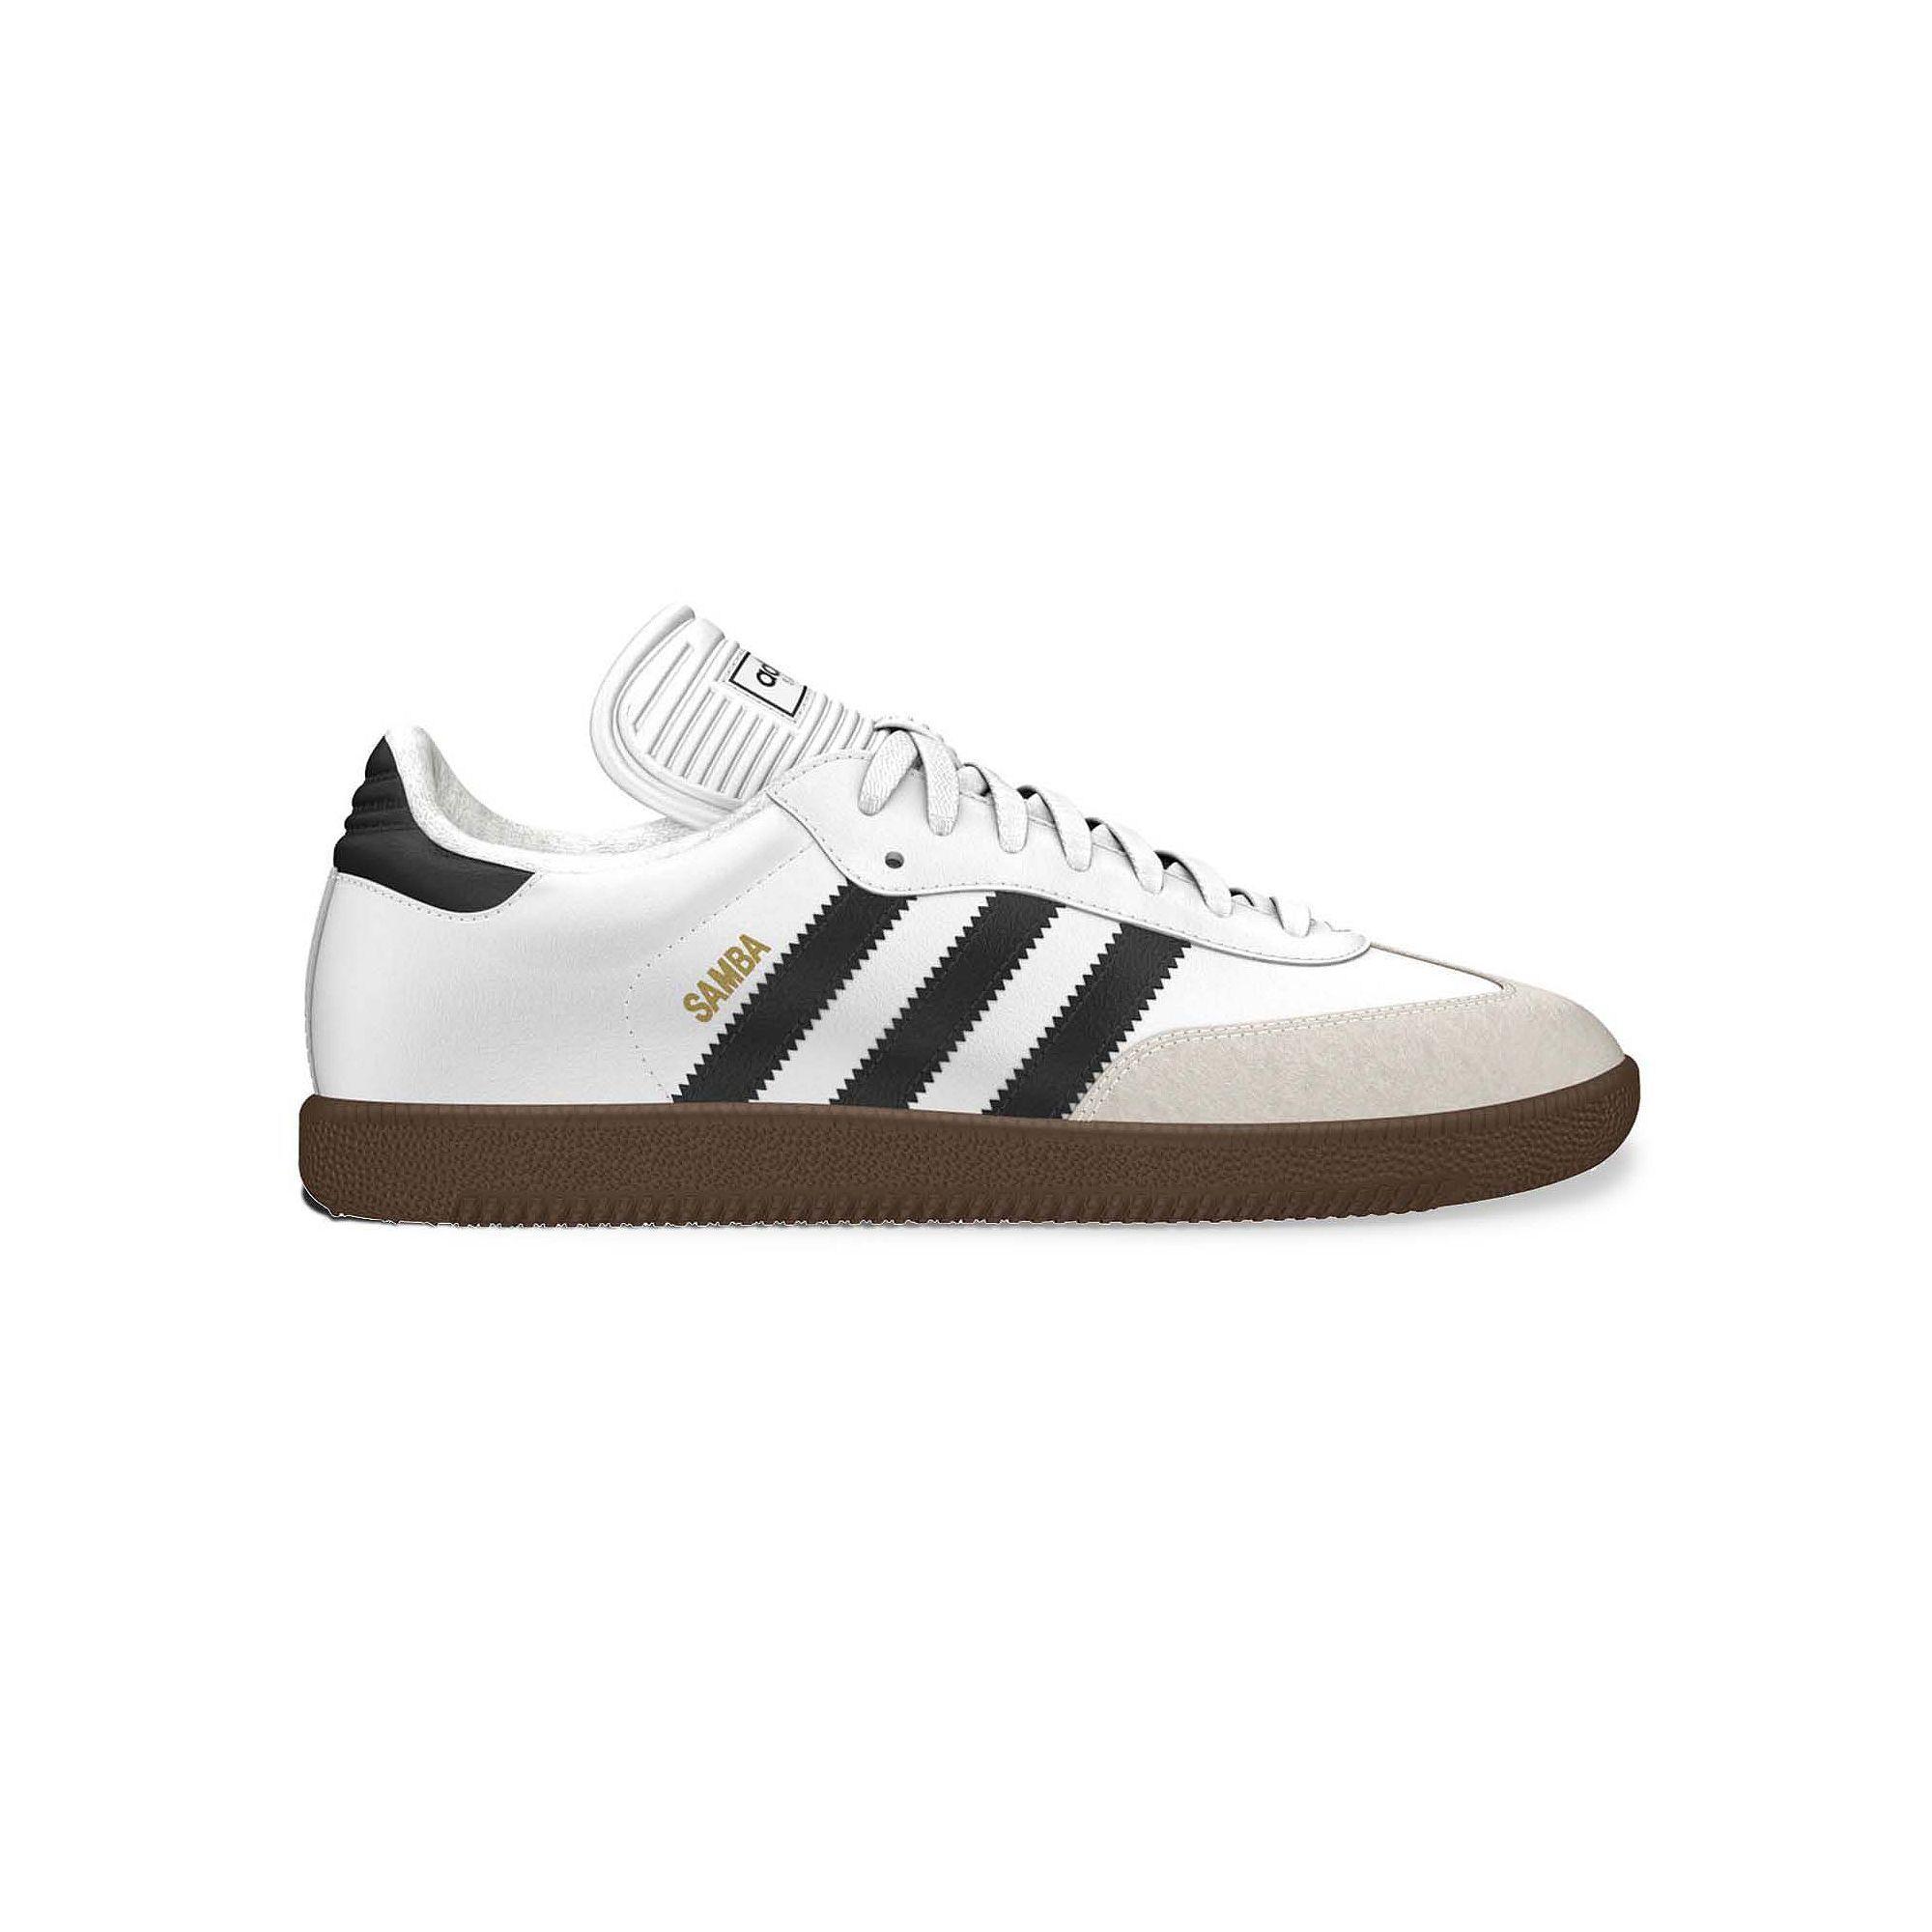 a093afbc383 adidas Samba Indoor Soccer Shoes - Men